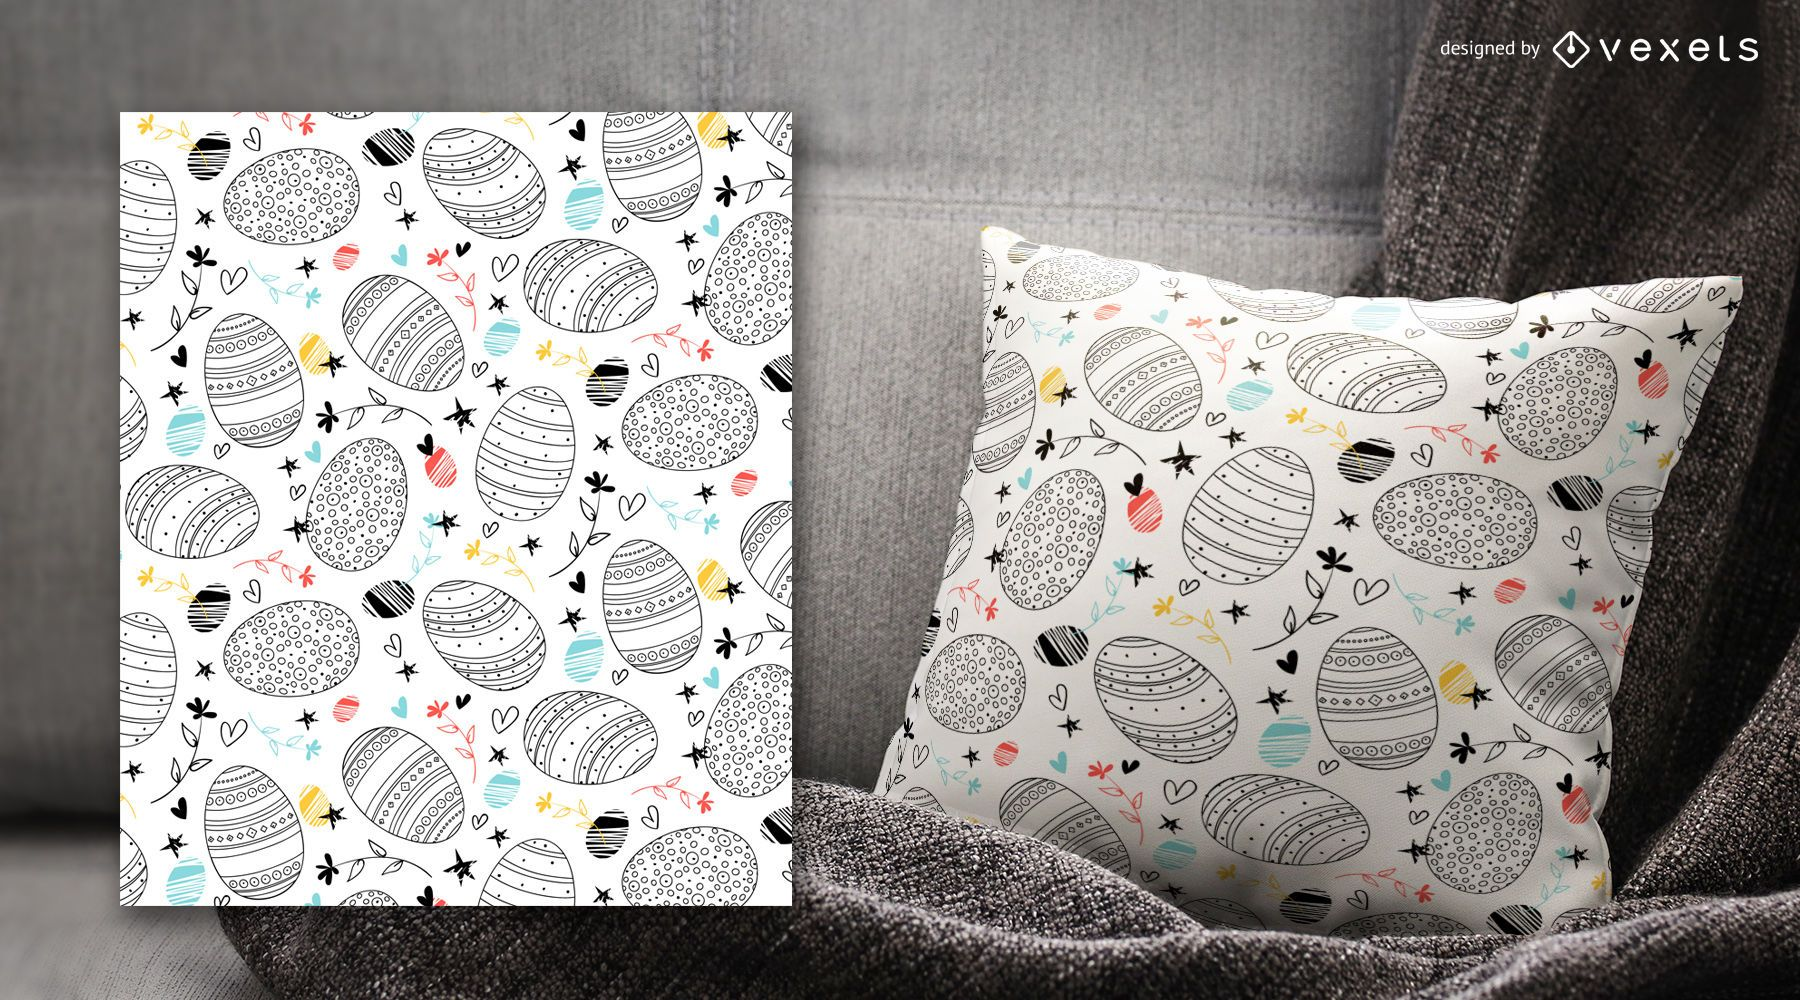 Trazo decorado patrón de huevos de Pascua - Descargar vector